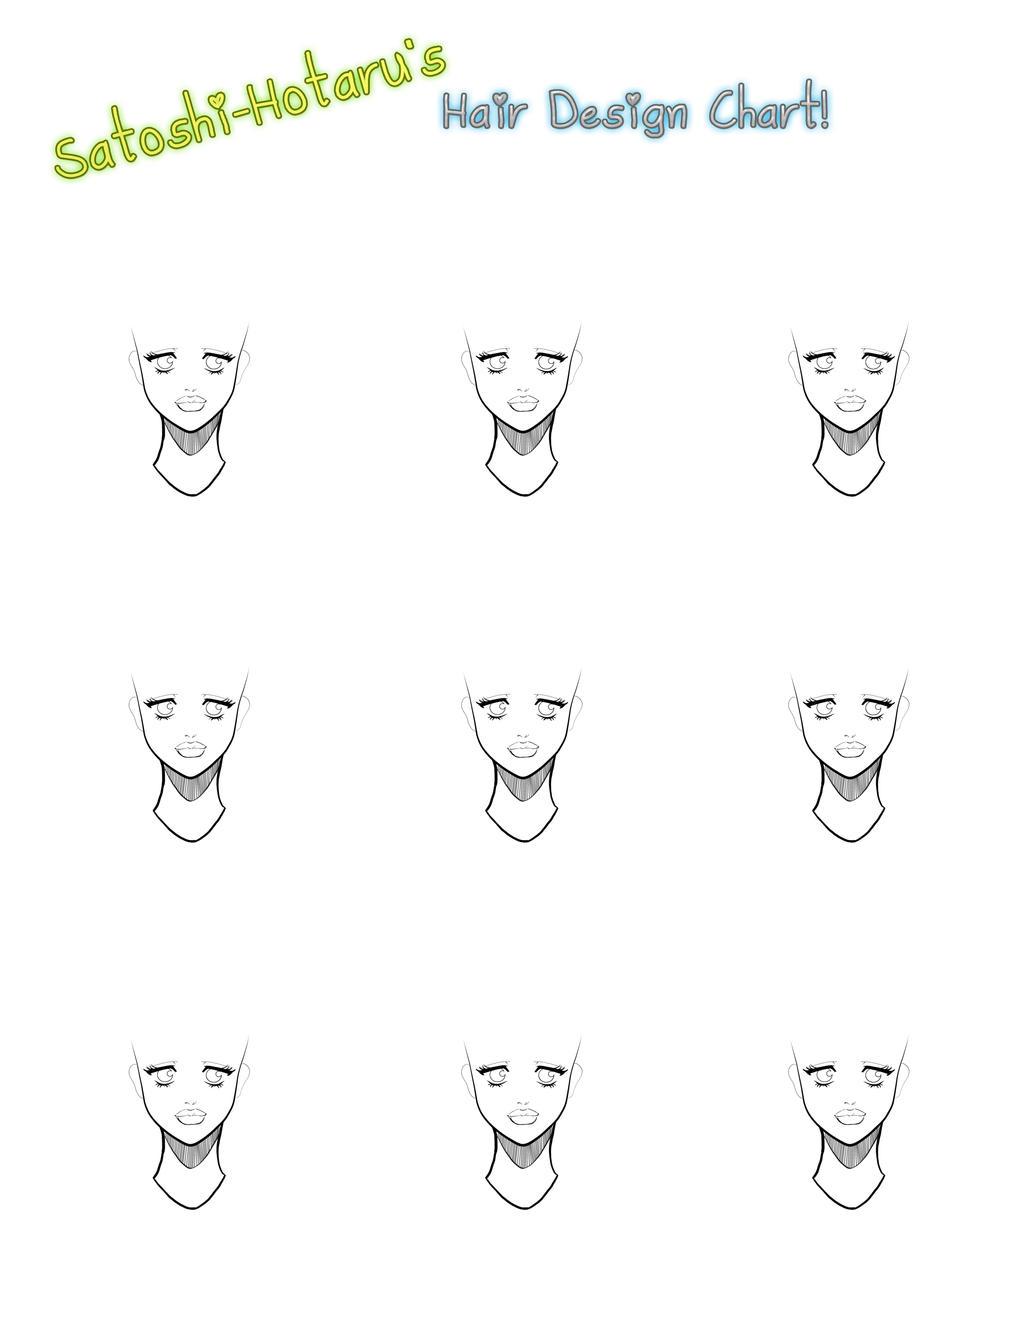 Character Design Chart : Blank hair design sheet by satoshi hotaru on deviantart